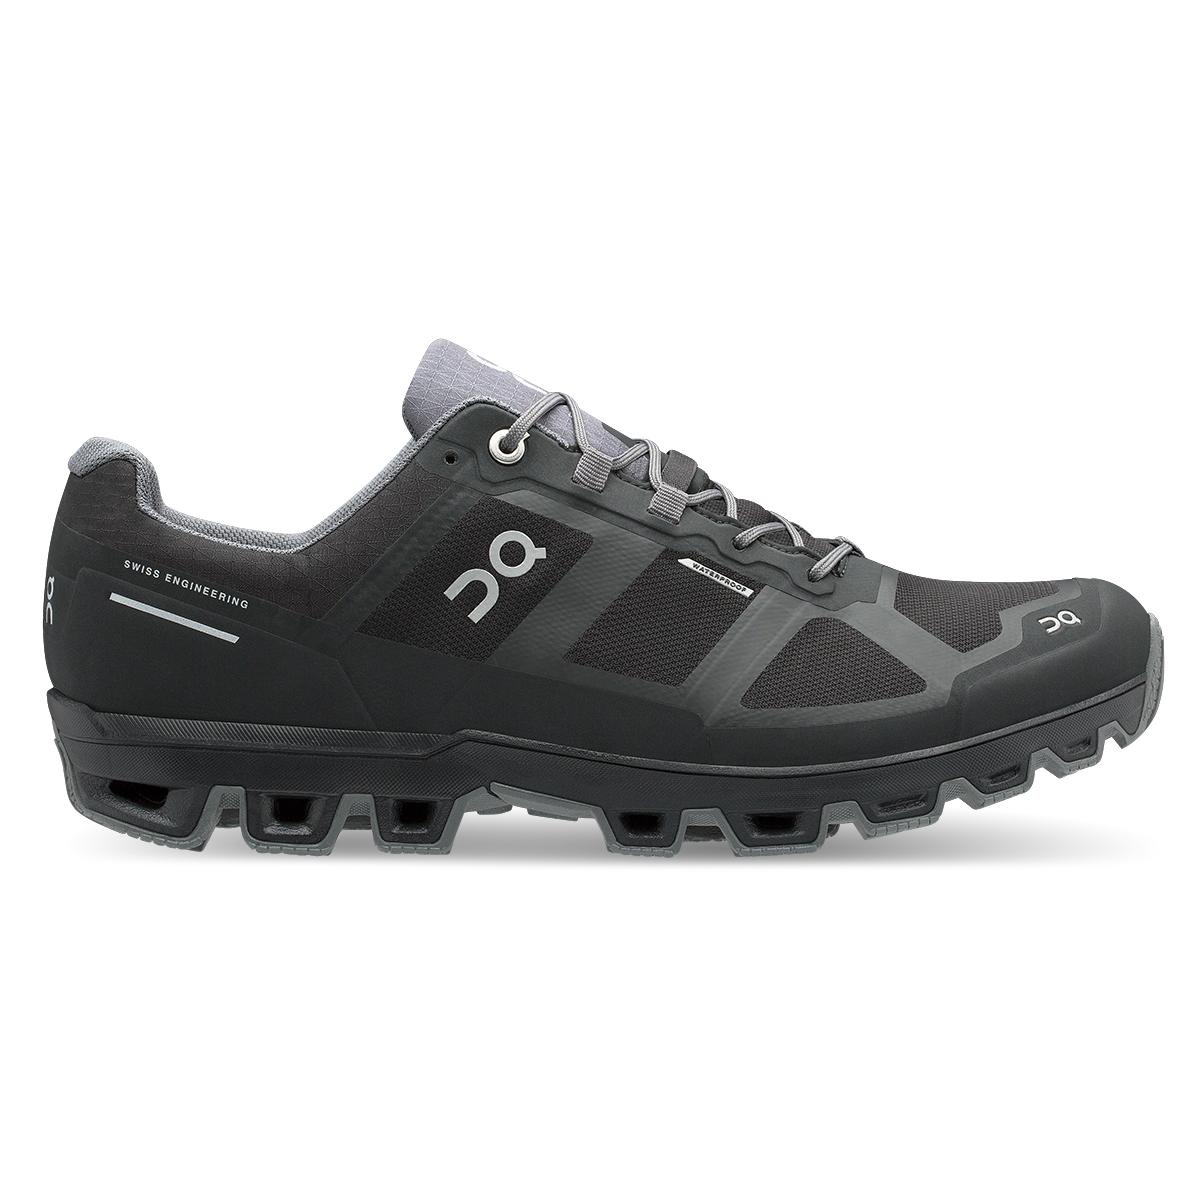 Women's On Cloudventure Waterproof Trail Running Shoe - Color: Black/Graphit - Size: 5 - Width: Regular, Black/Graphit, large, image 1